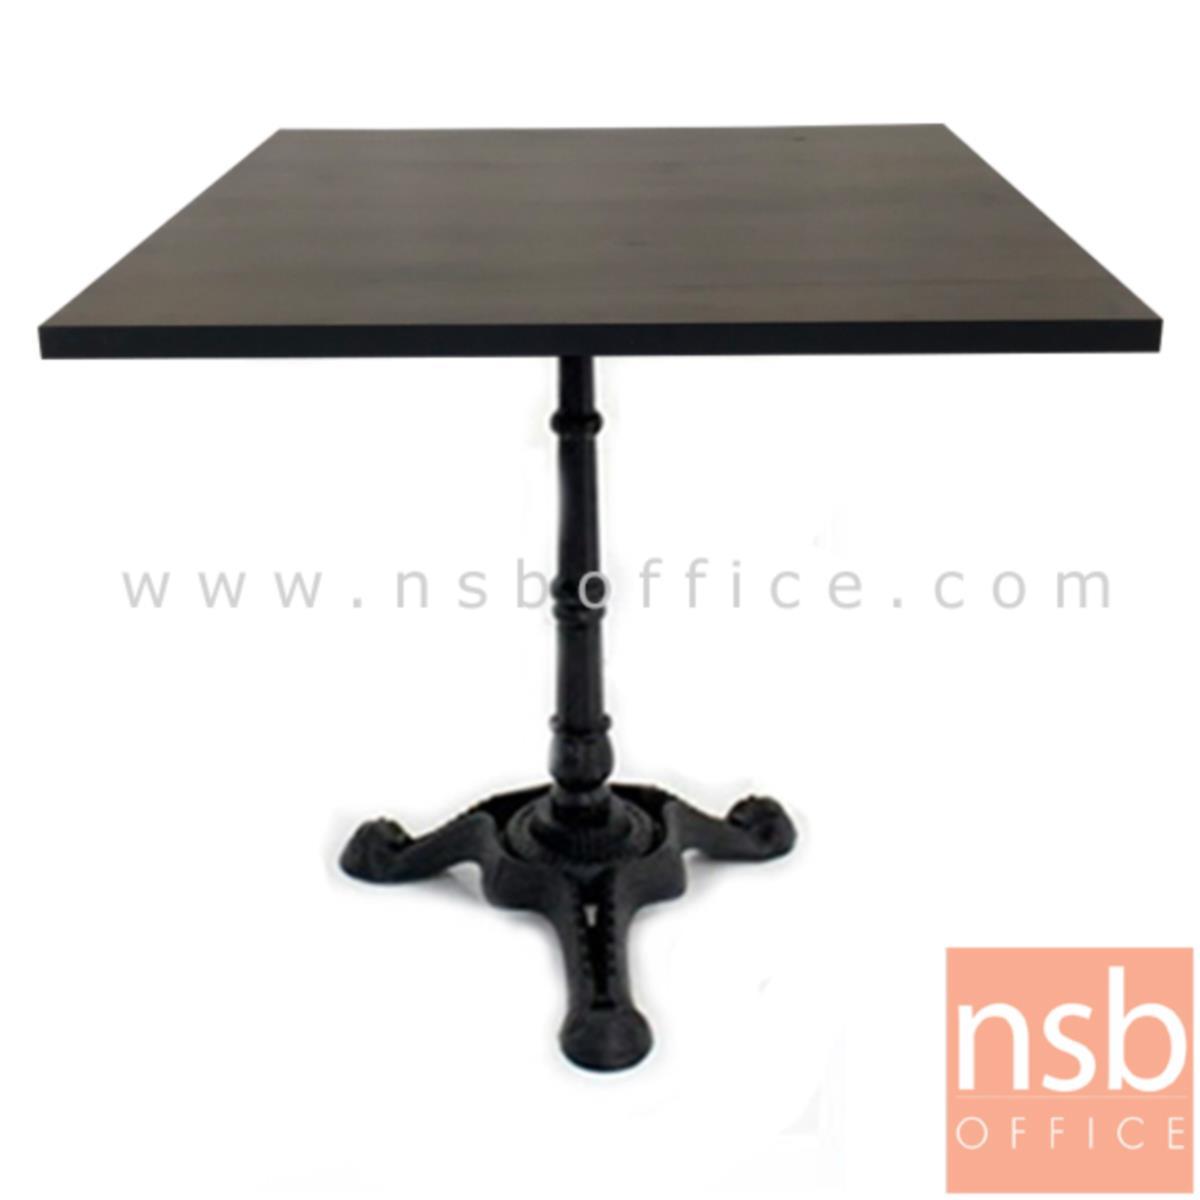 A14A170:โต๊ะบาร์ COFFEE รุ่น H-CF23 ขนาด 60W ,70W ,80W ,60Di ,70Di ,80Di cm.   ขาเหล็กฐานสามแฉกสีดำ